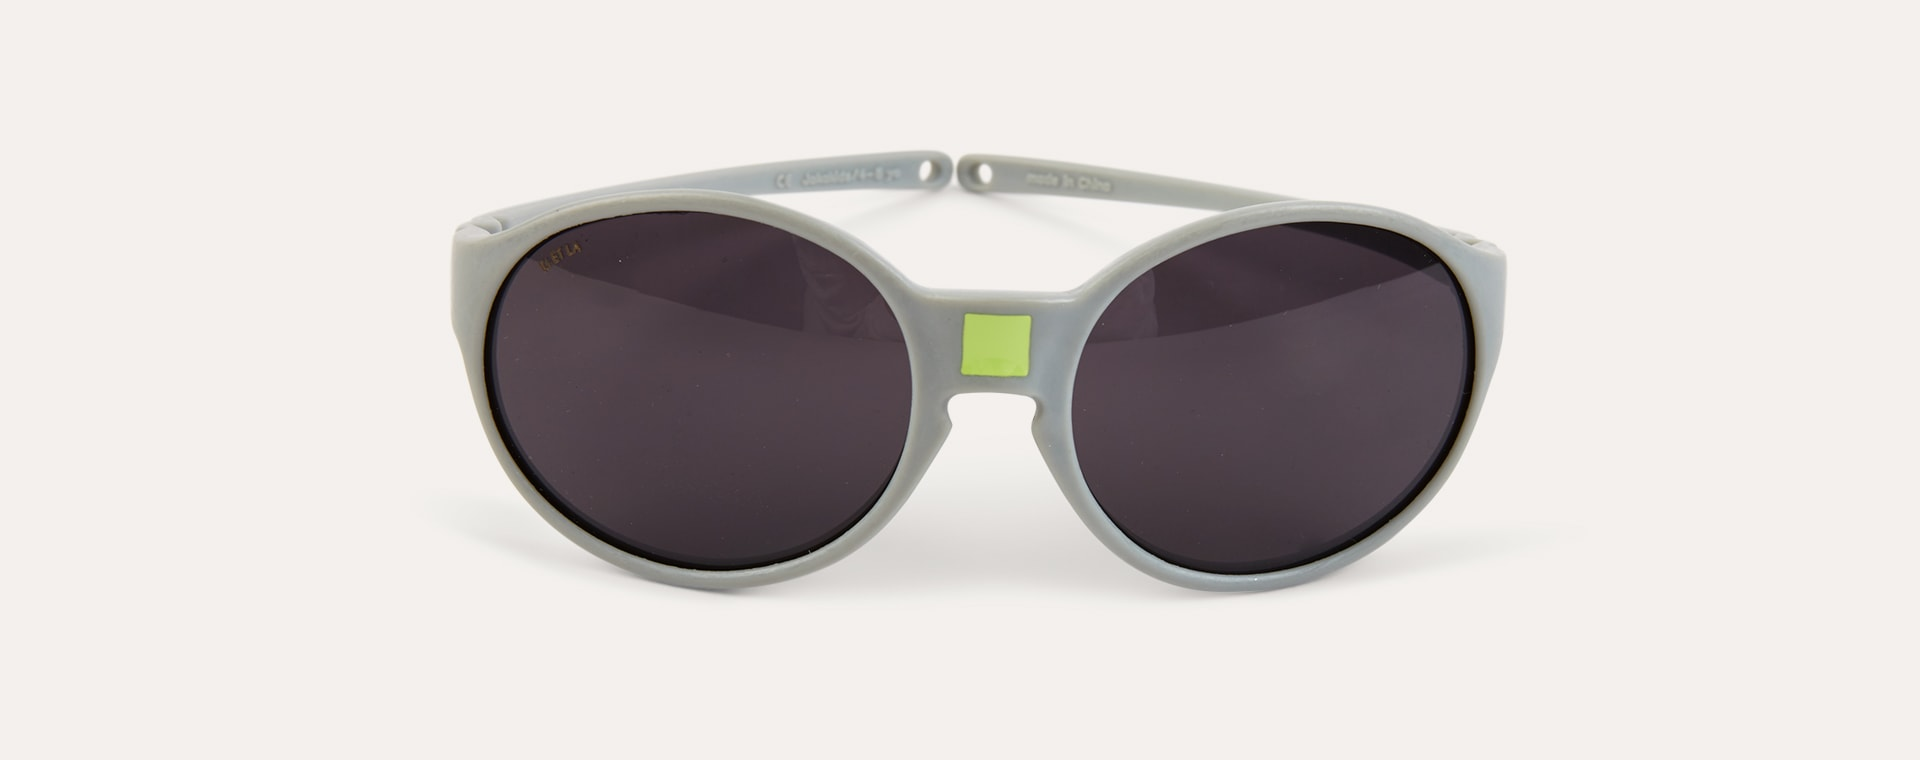 Souris Ki ET LA Jokakids' Kids Sunglasses